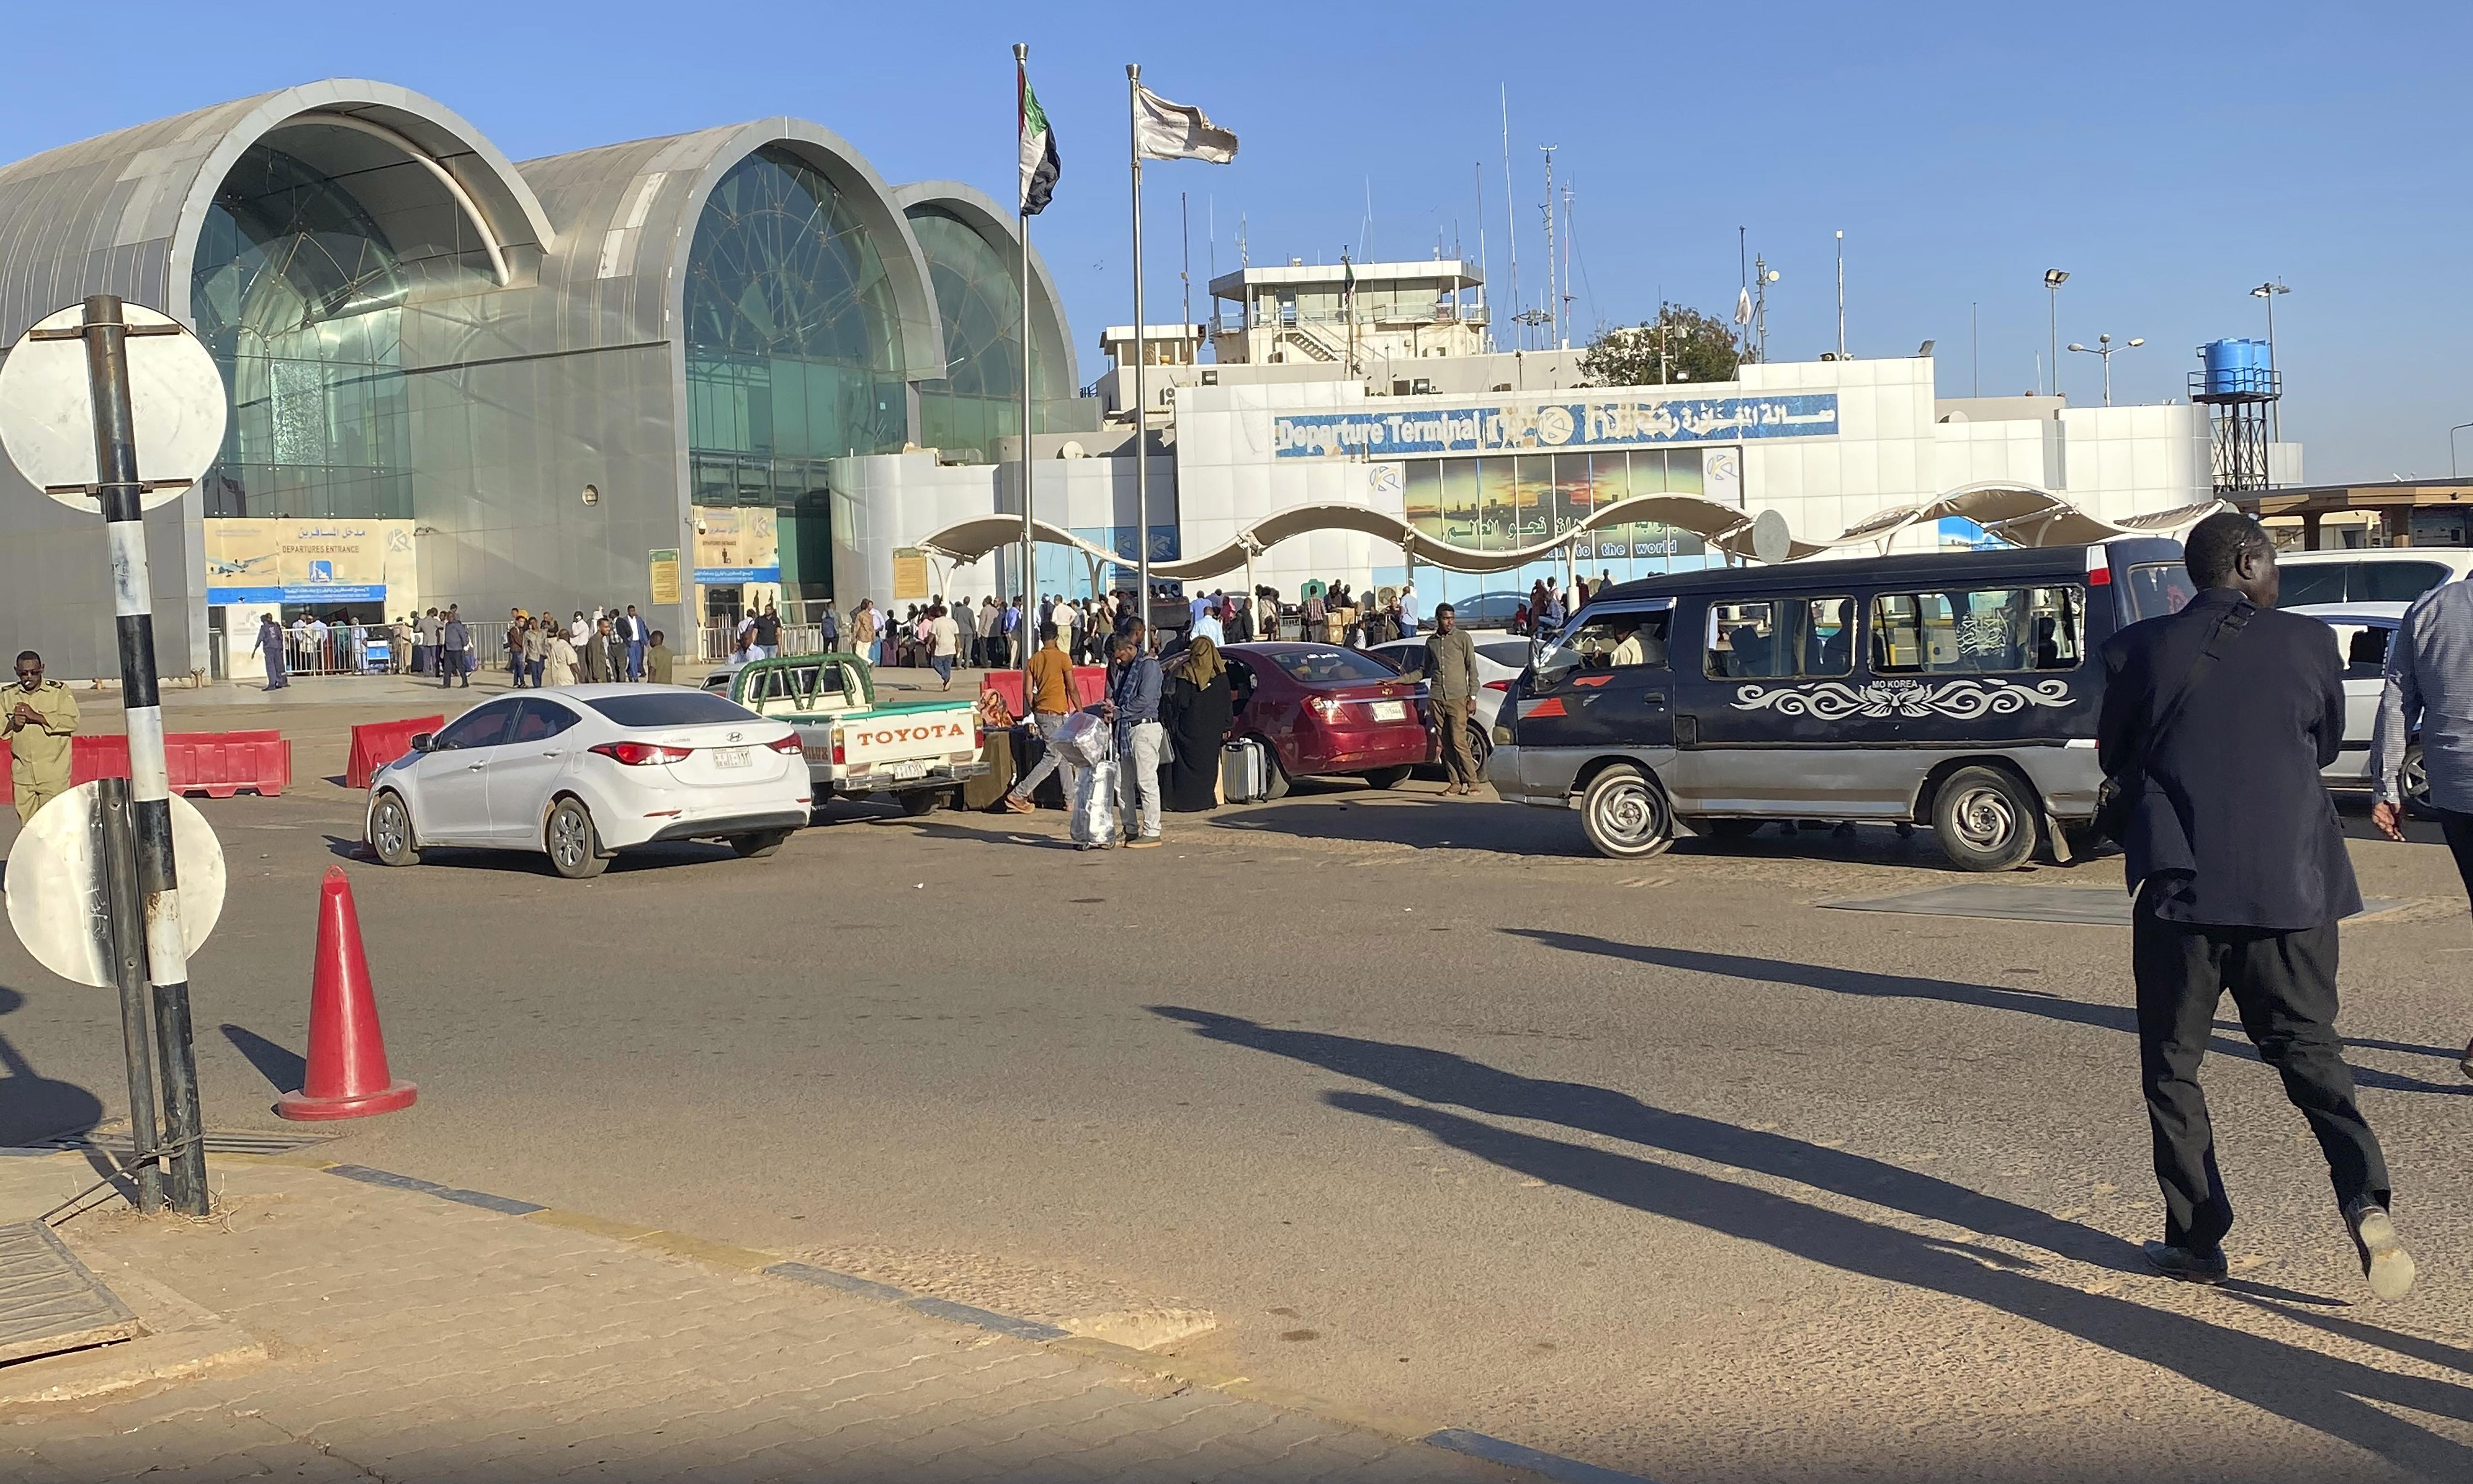 Sudanese asylum seeker flown back to UK after Khartoum gunfight delay